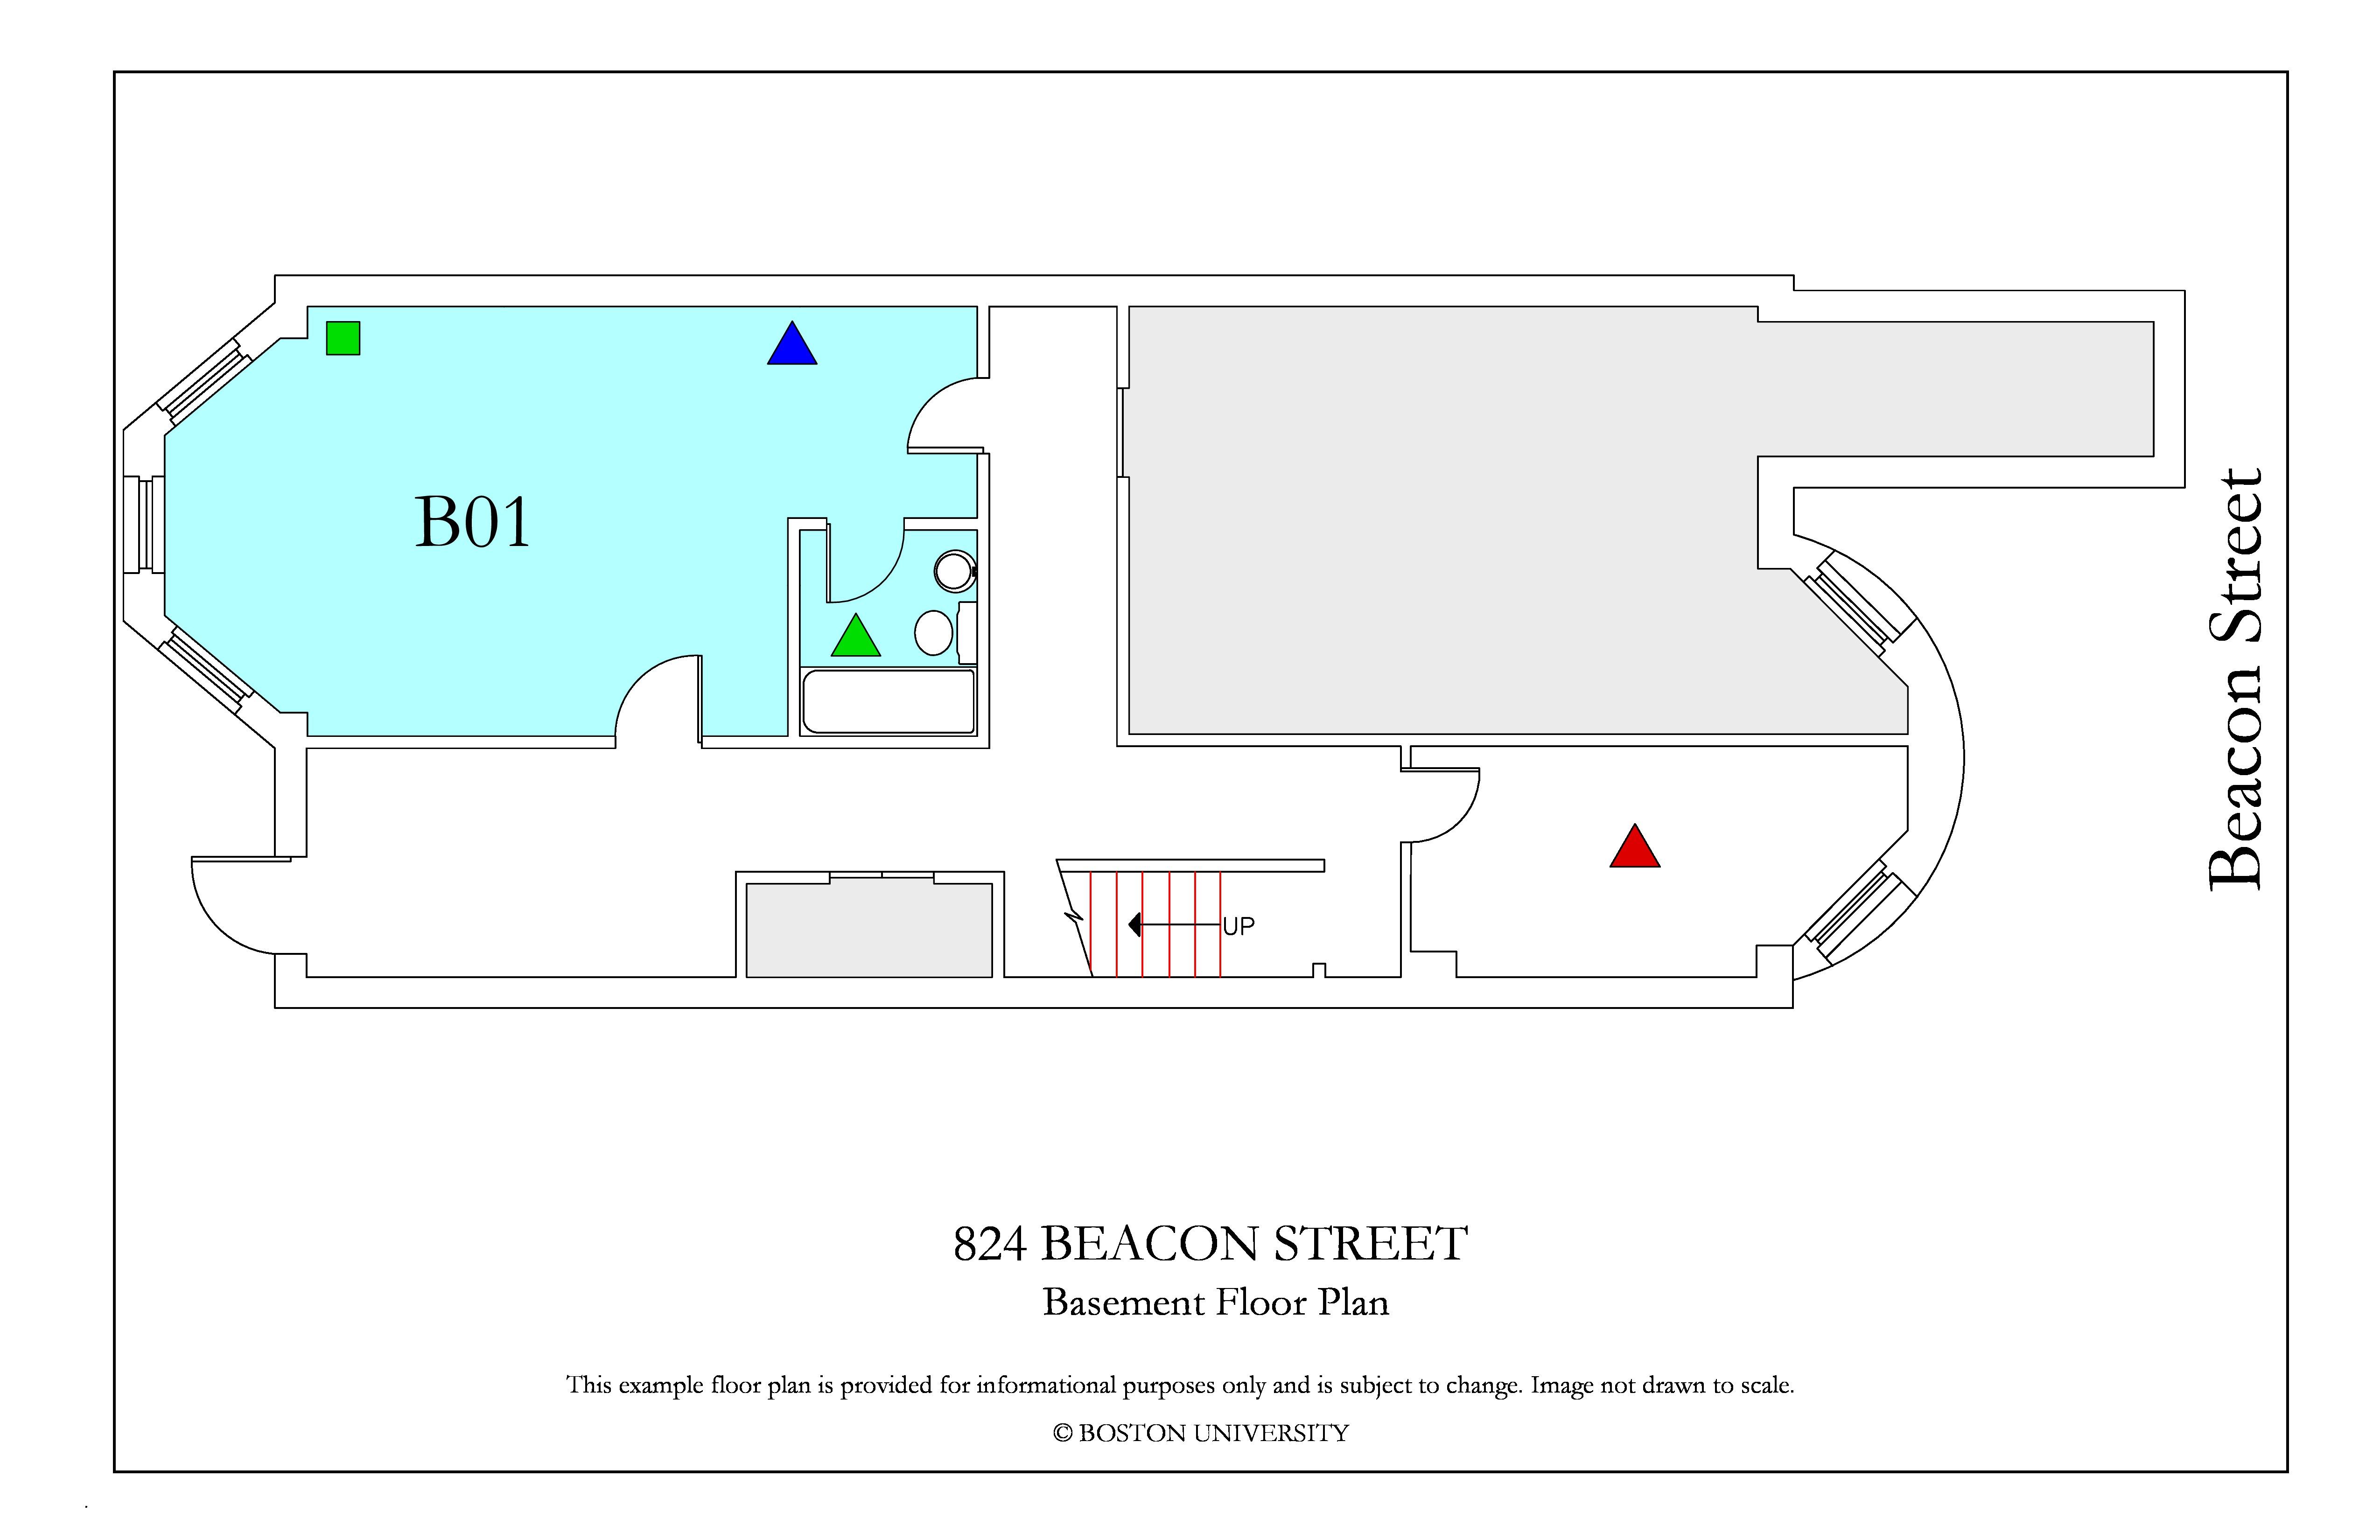 824 Beacon Street_BasementFloor